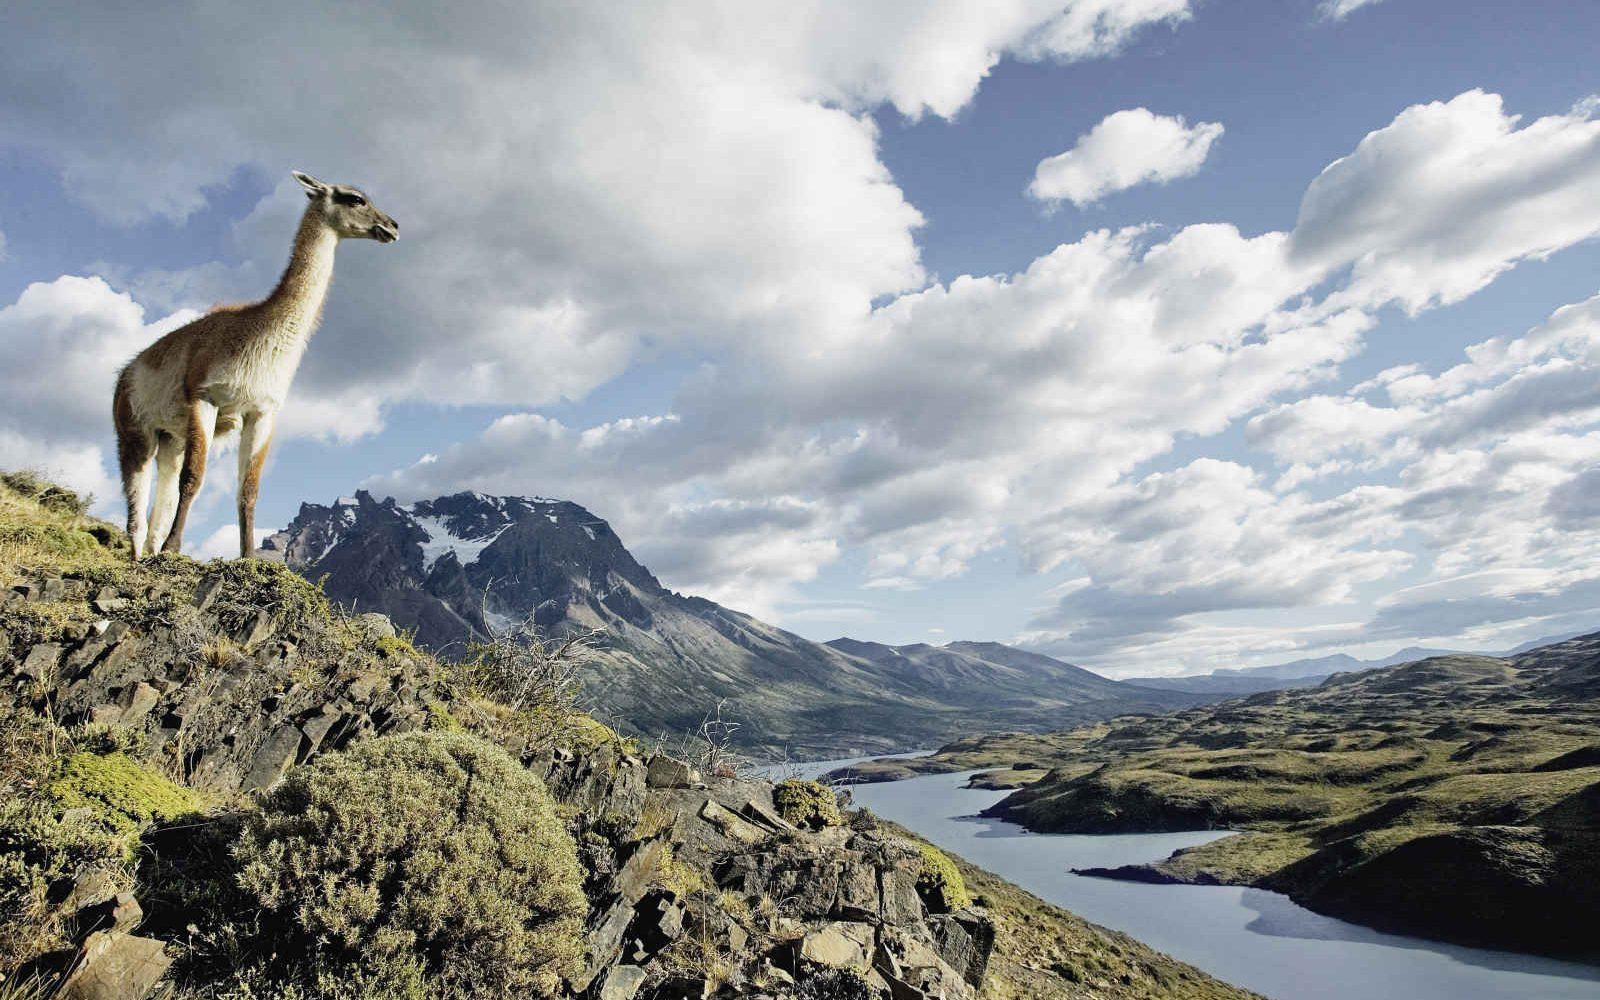 Lama guanaco, Lac Nordenskjold, Torres del Paine, Argentine